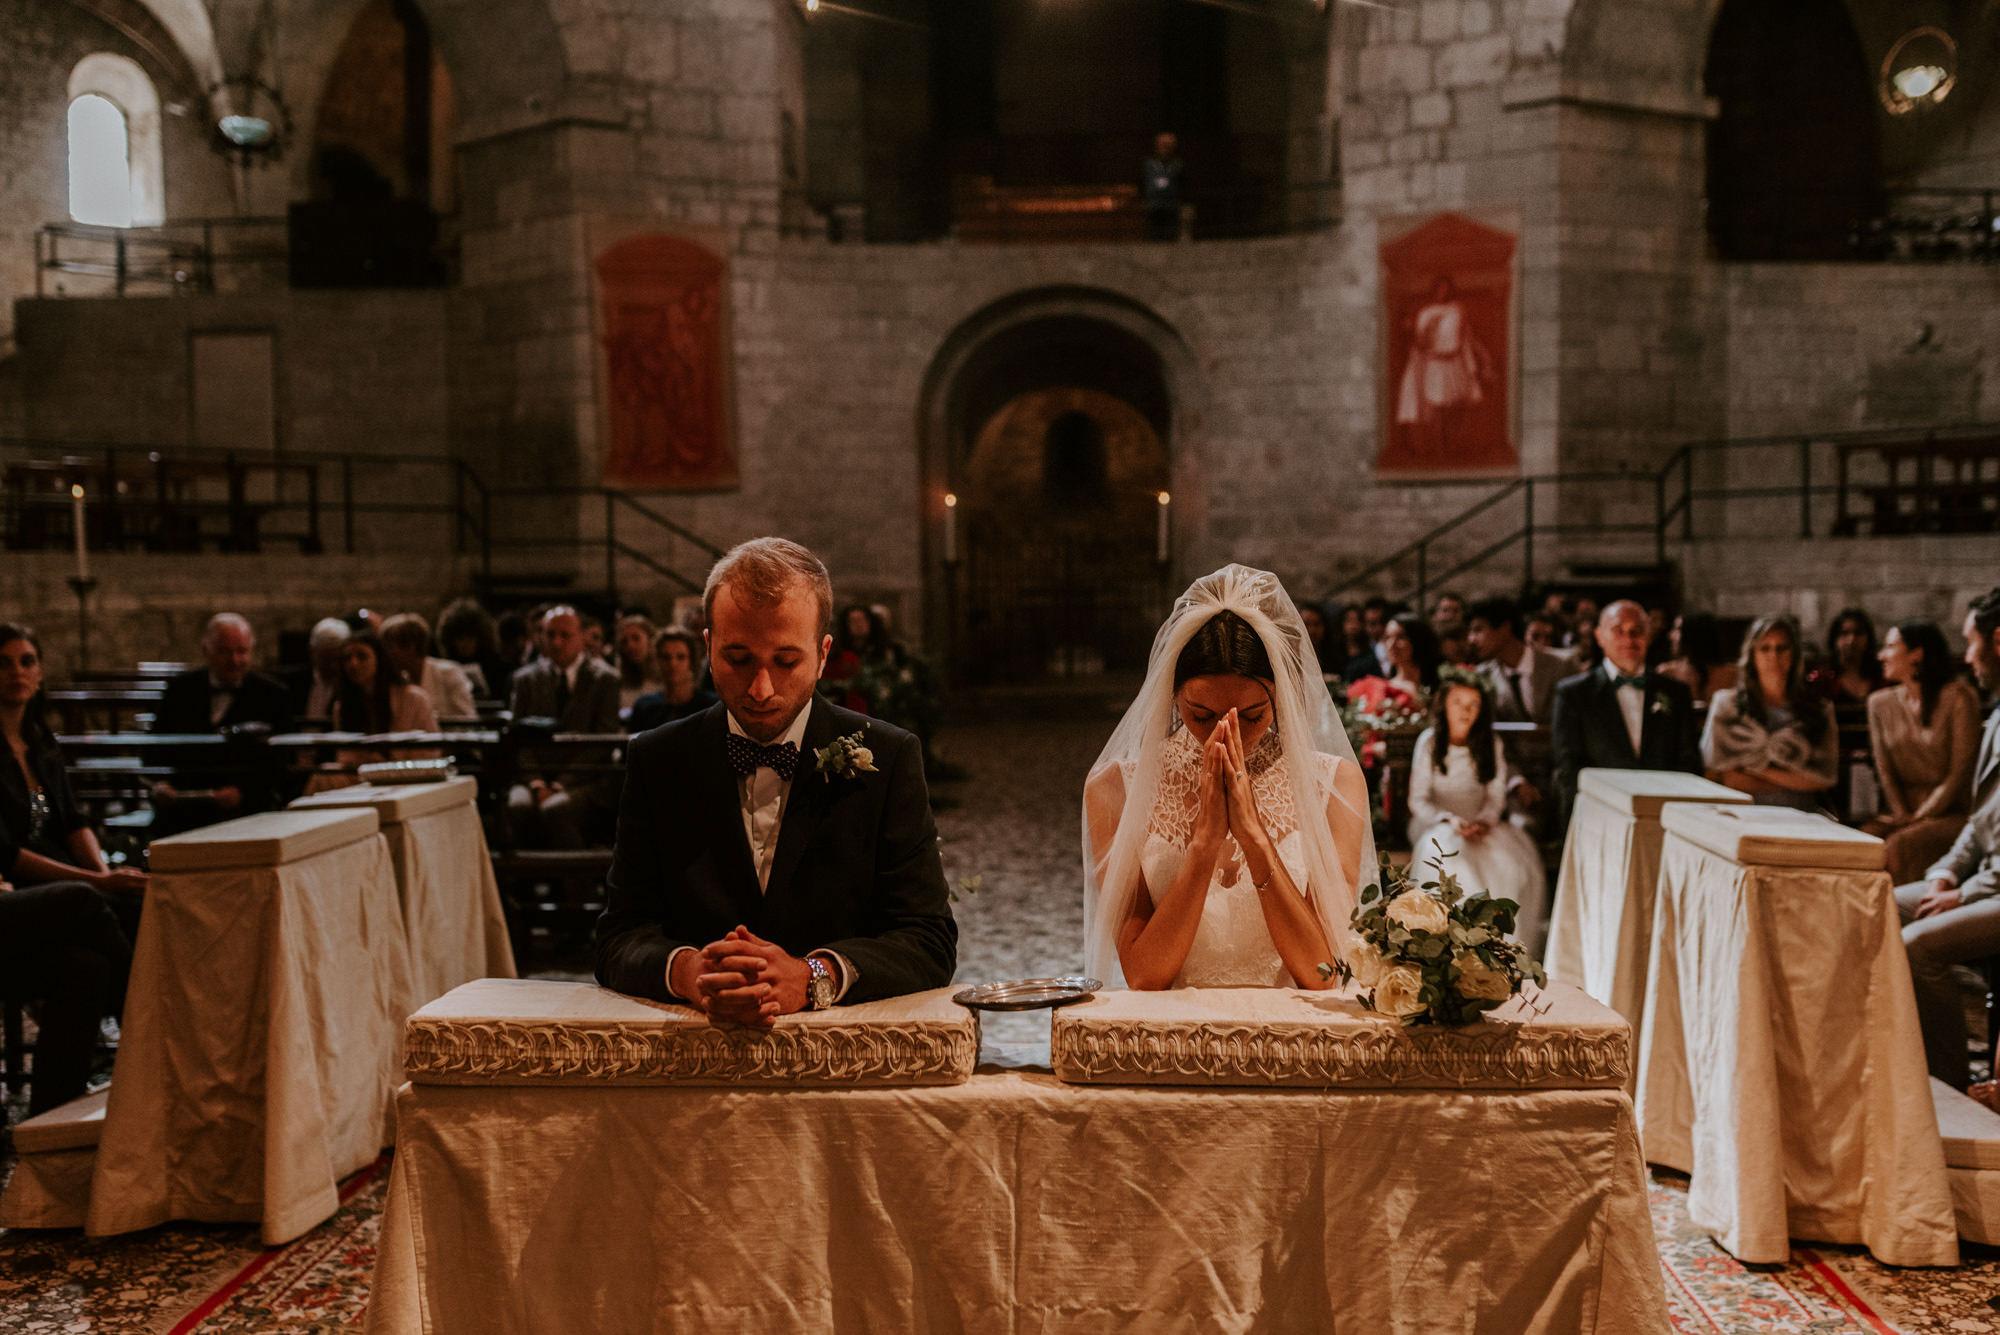 FOTO+PHOTO+BODA+WEDDING+ITALIA+ITALY+MAURICIO+GARAY+MAURICIOGARAY+WEDDINPHOTOGRAPHER+FOTOGRAFODEBODA-988.jpg